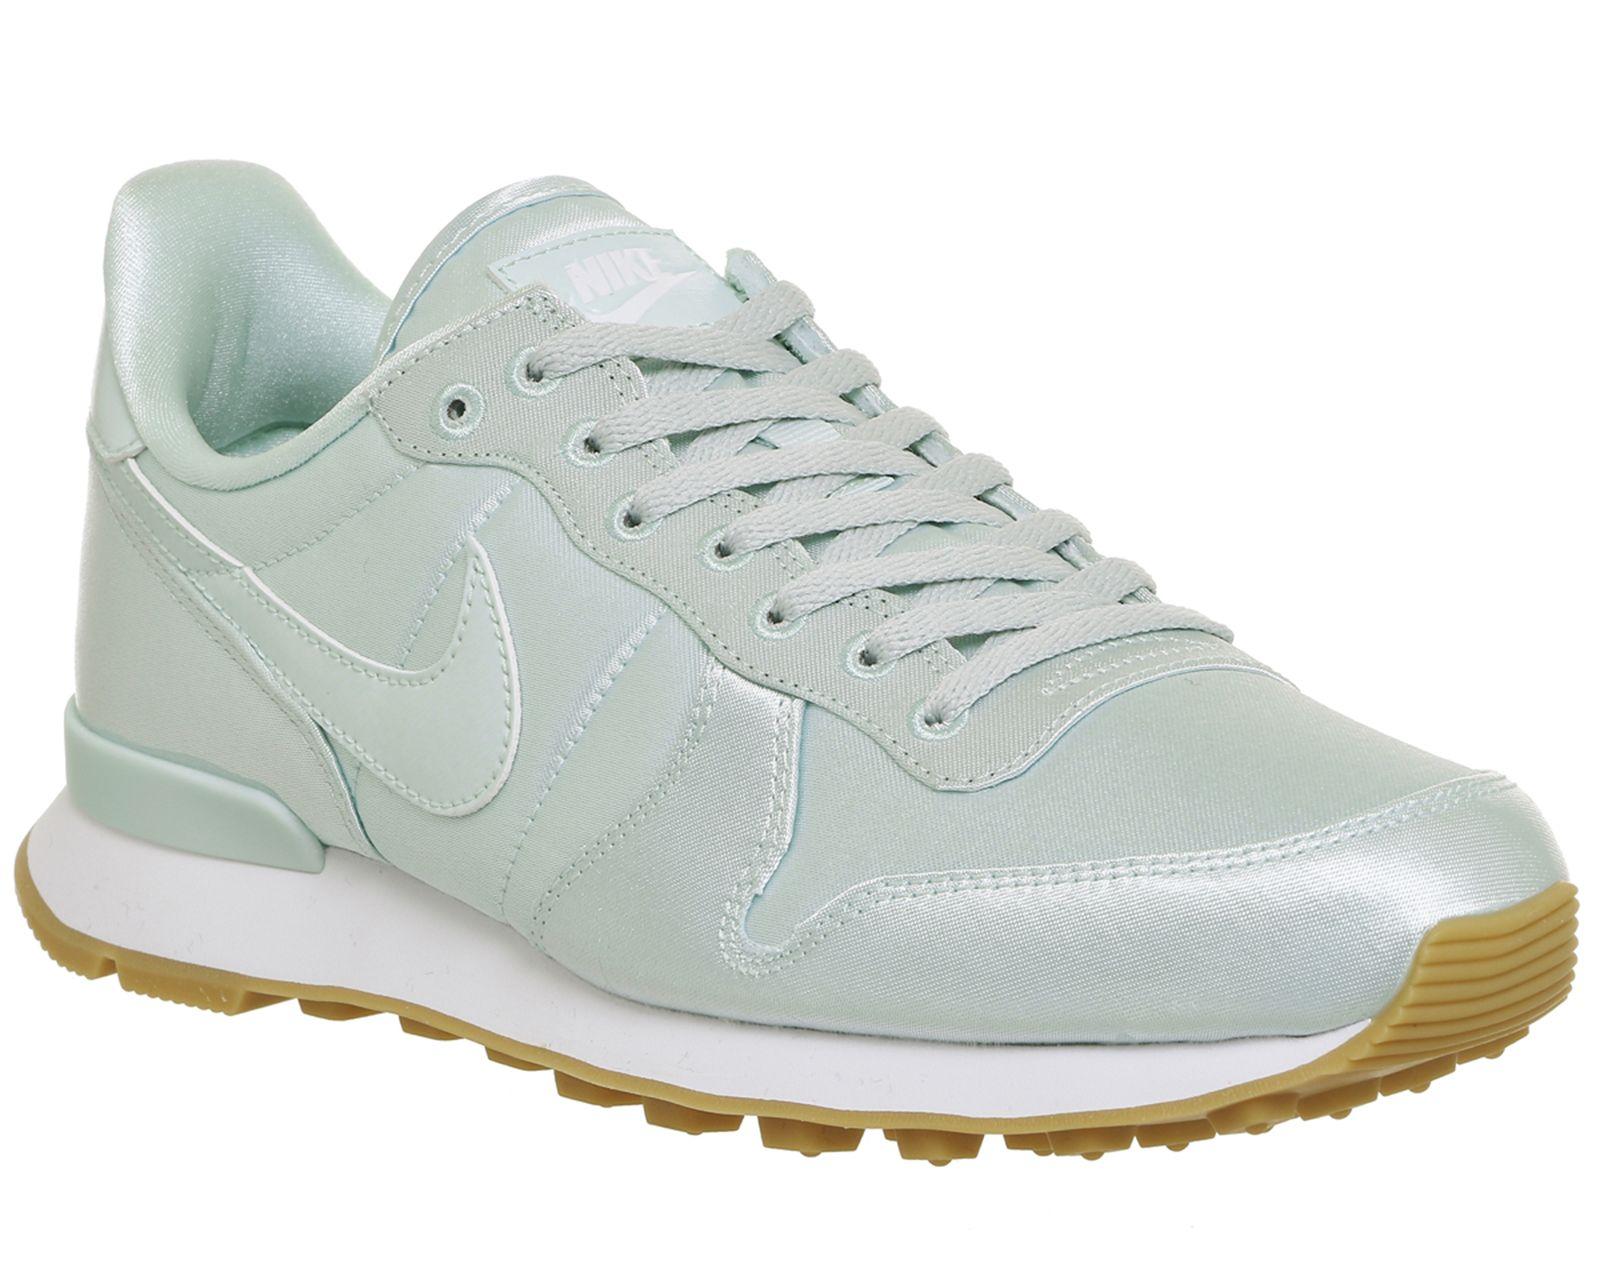 Nike Internationalist | Shoes | Nike internationalist, Nike